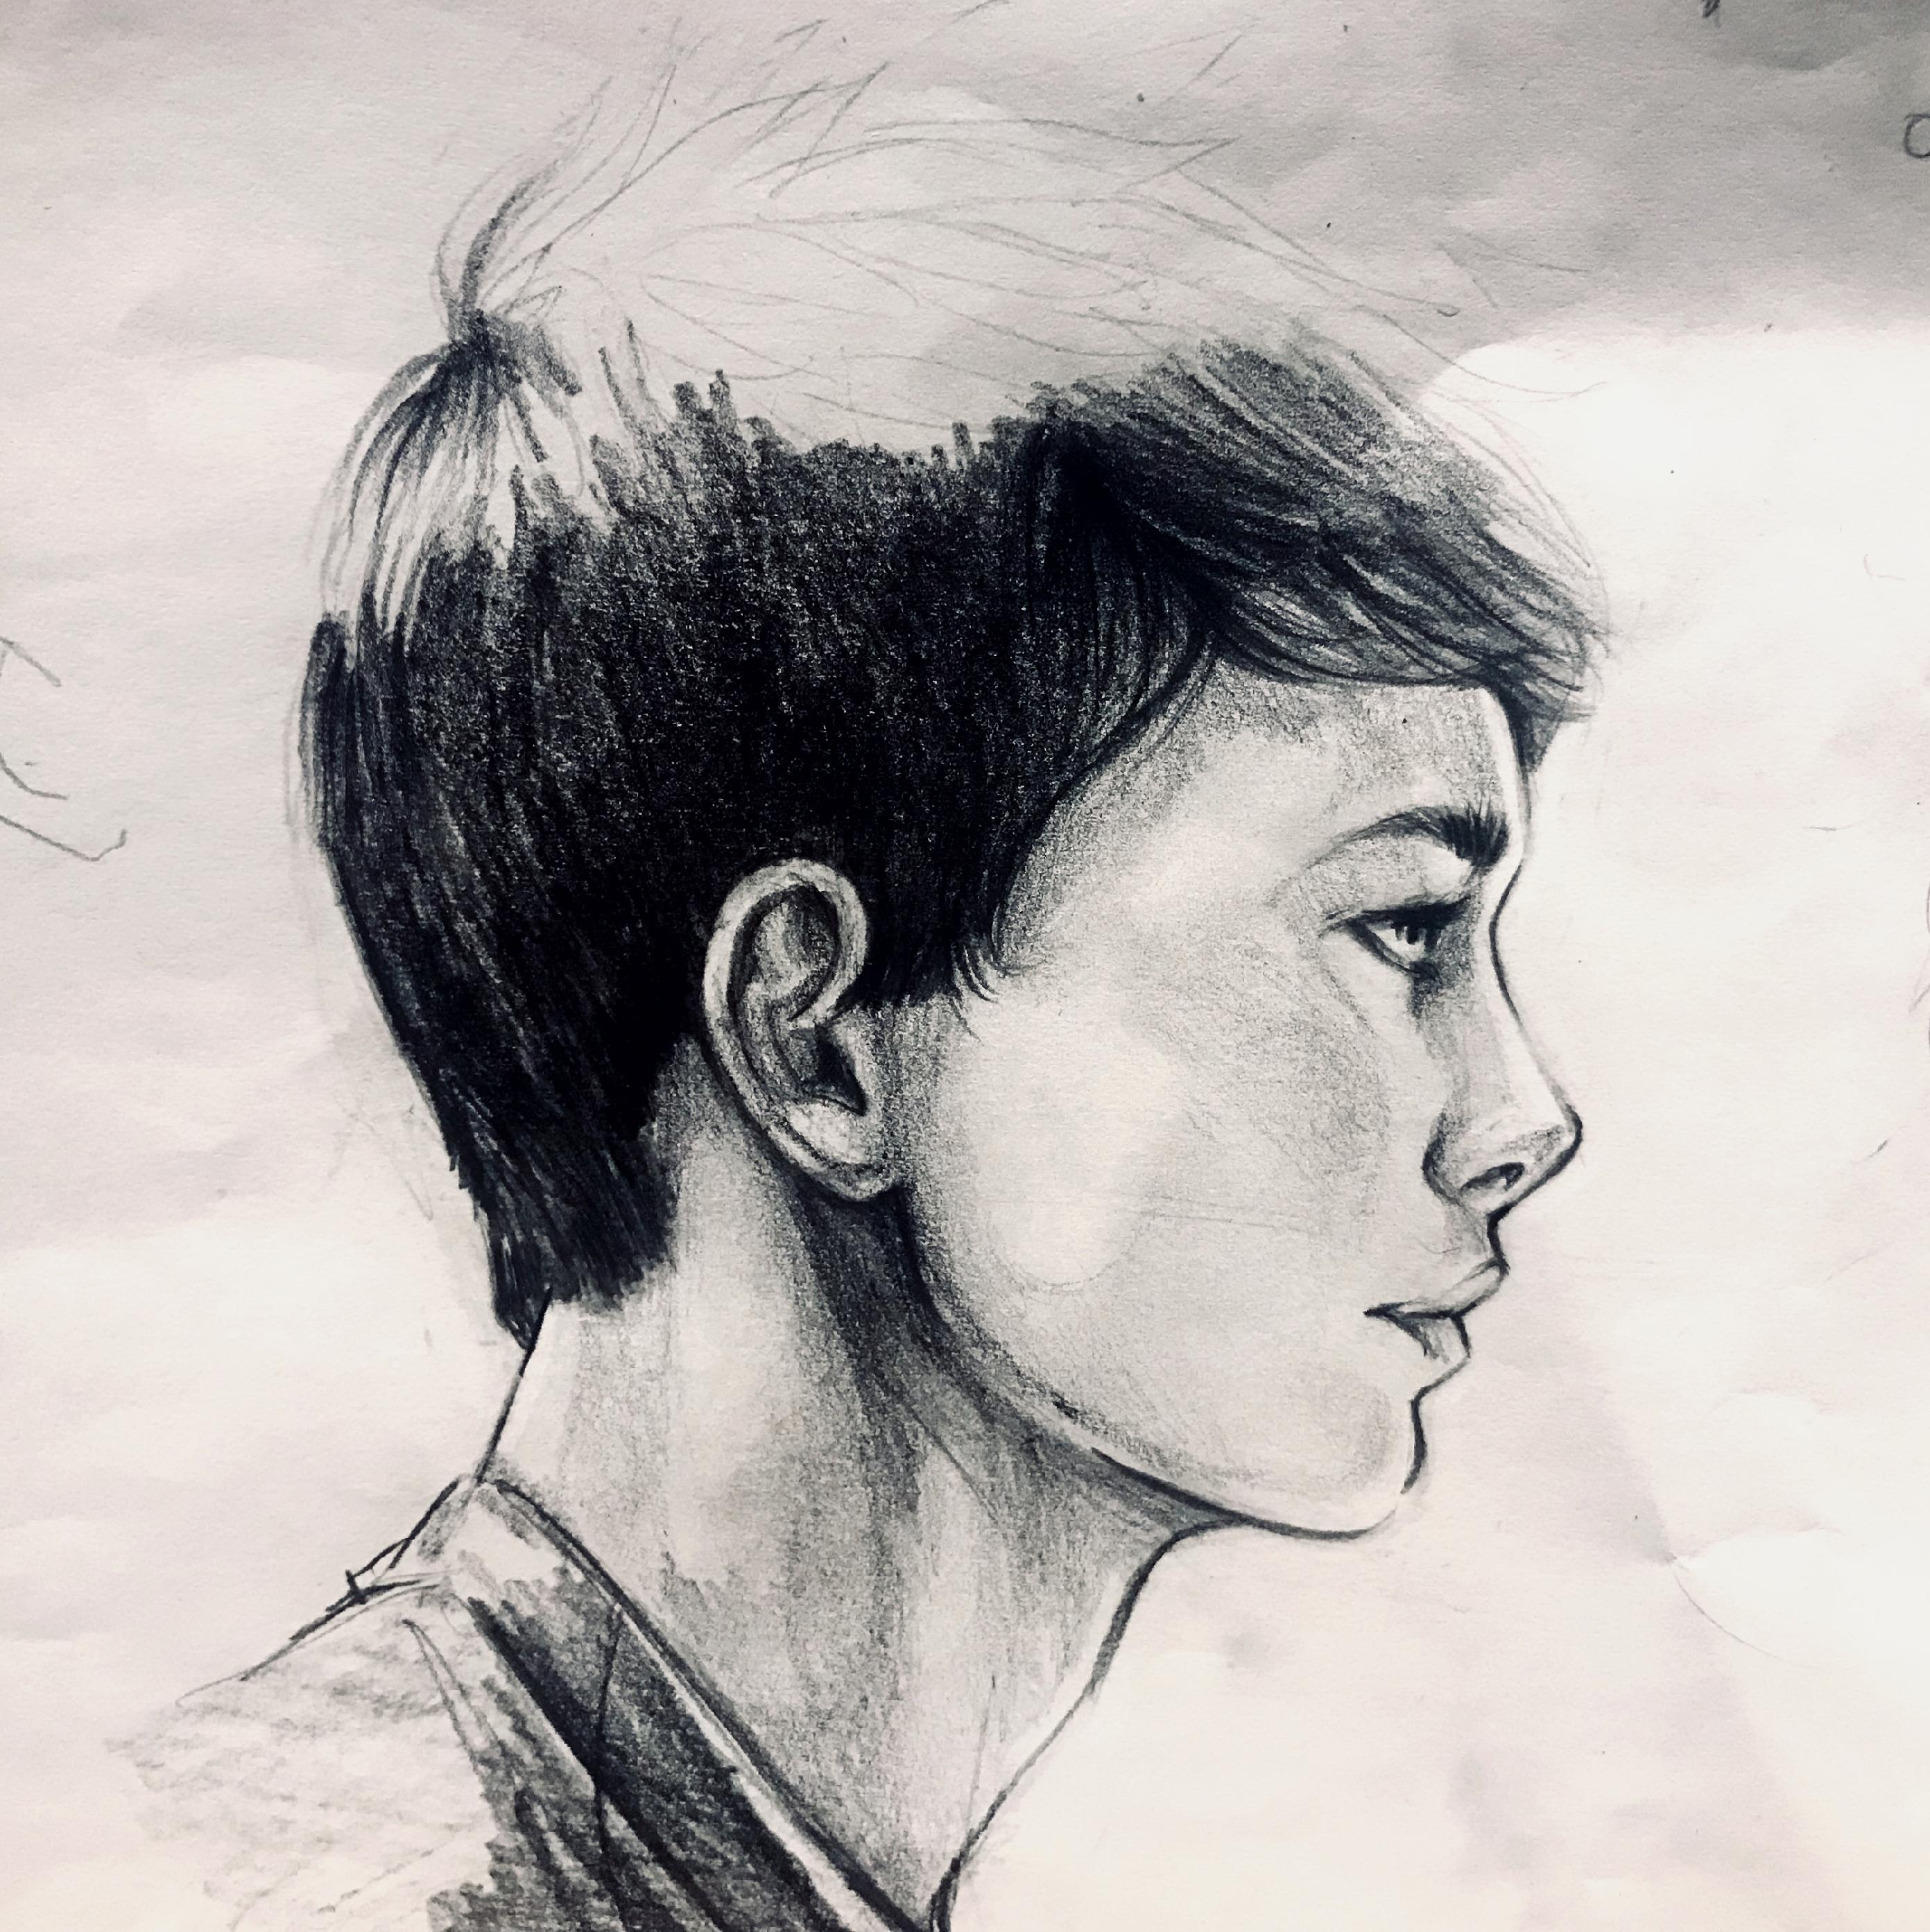 Profile man study